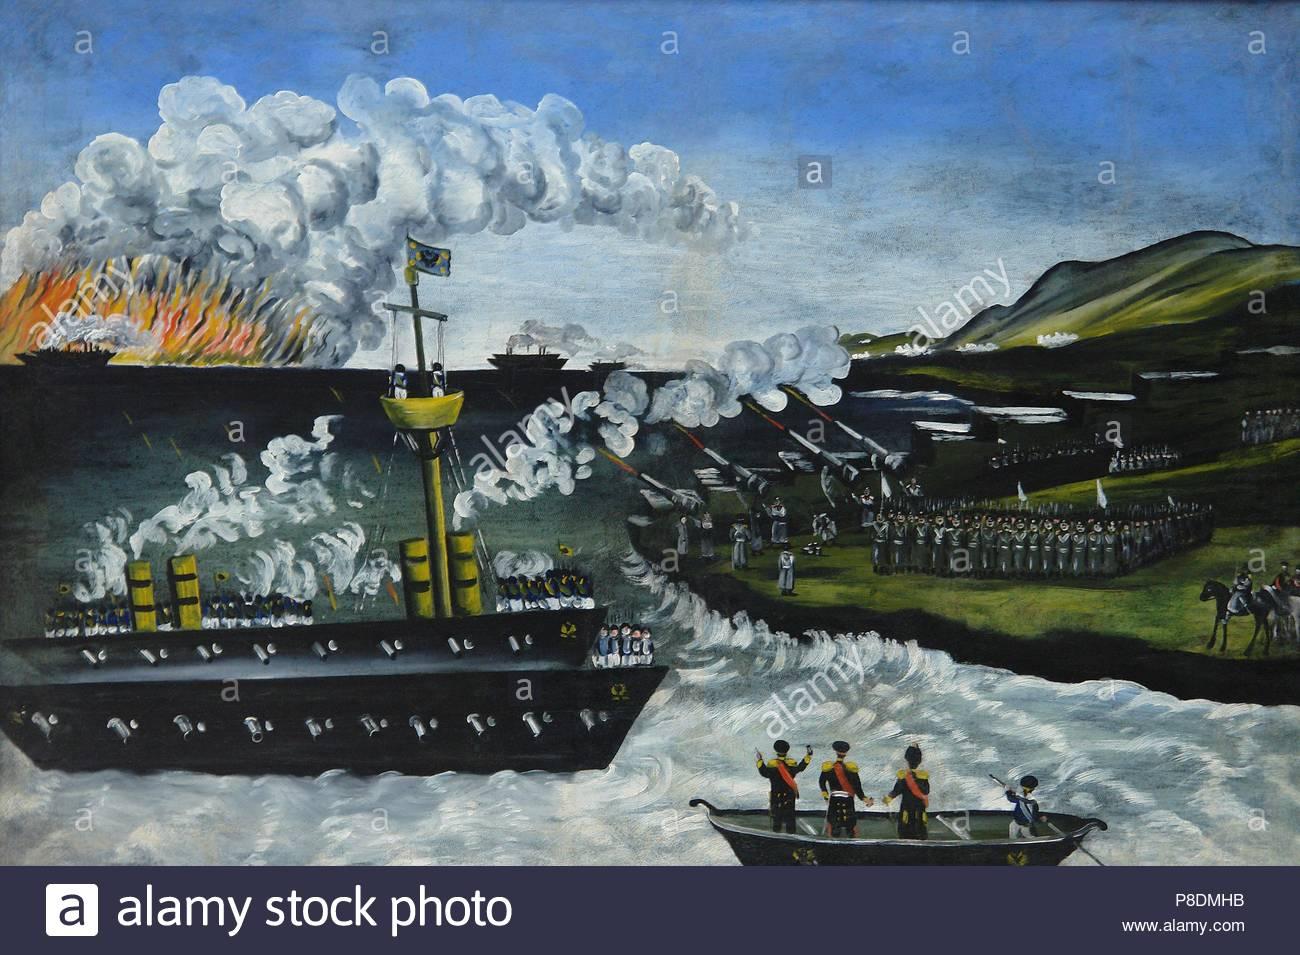 el arte japons de la guerra